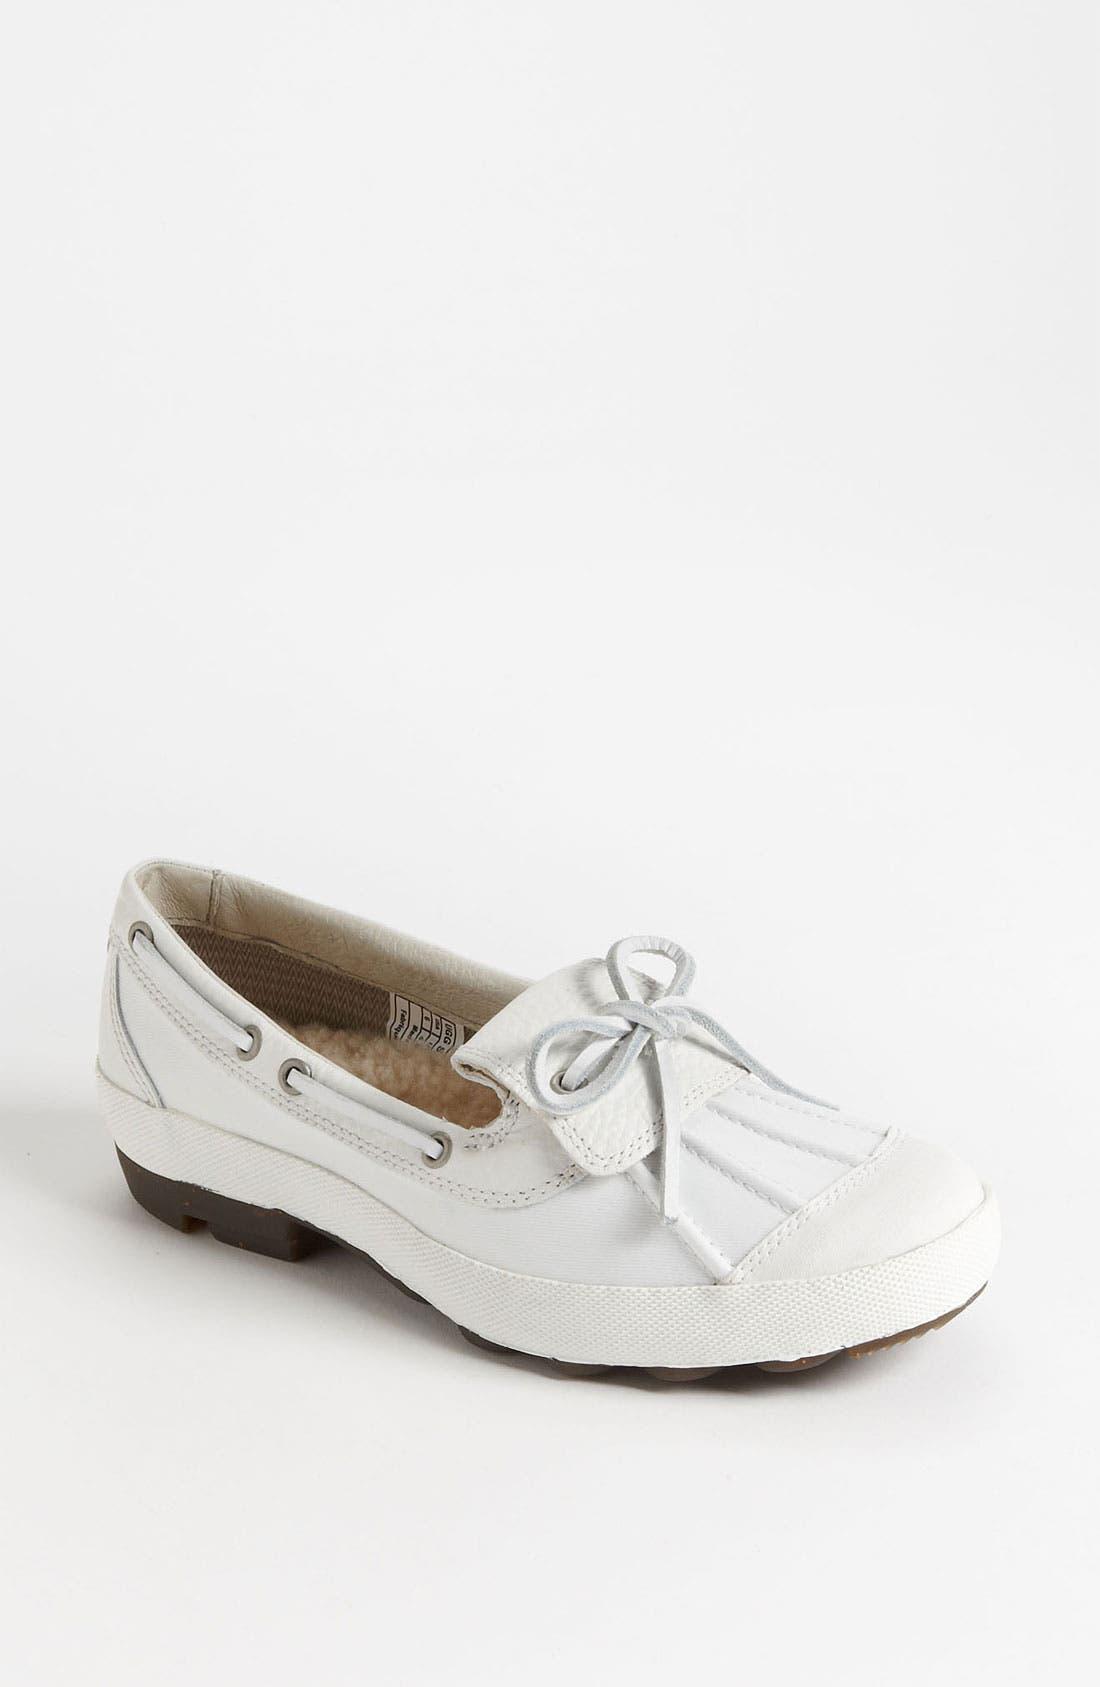 Alternate Image 1 Selected - UGG® Australia 'Ashdale' Duck Shoe (Women)